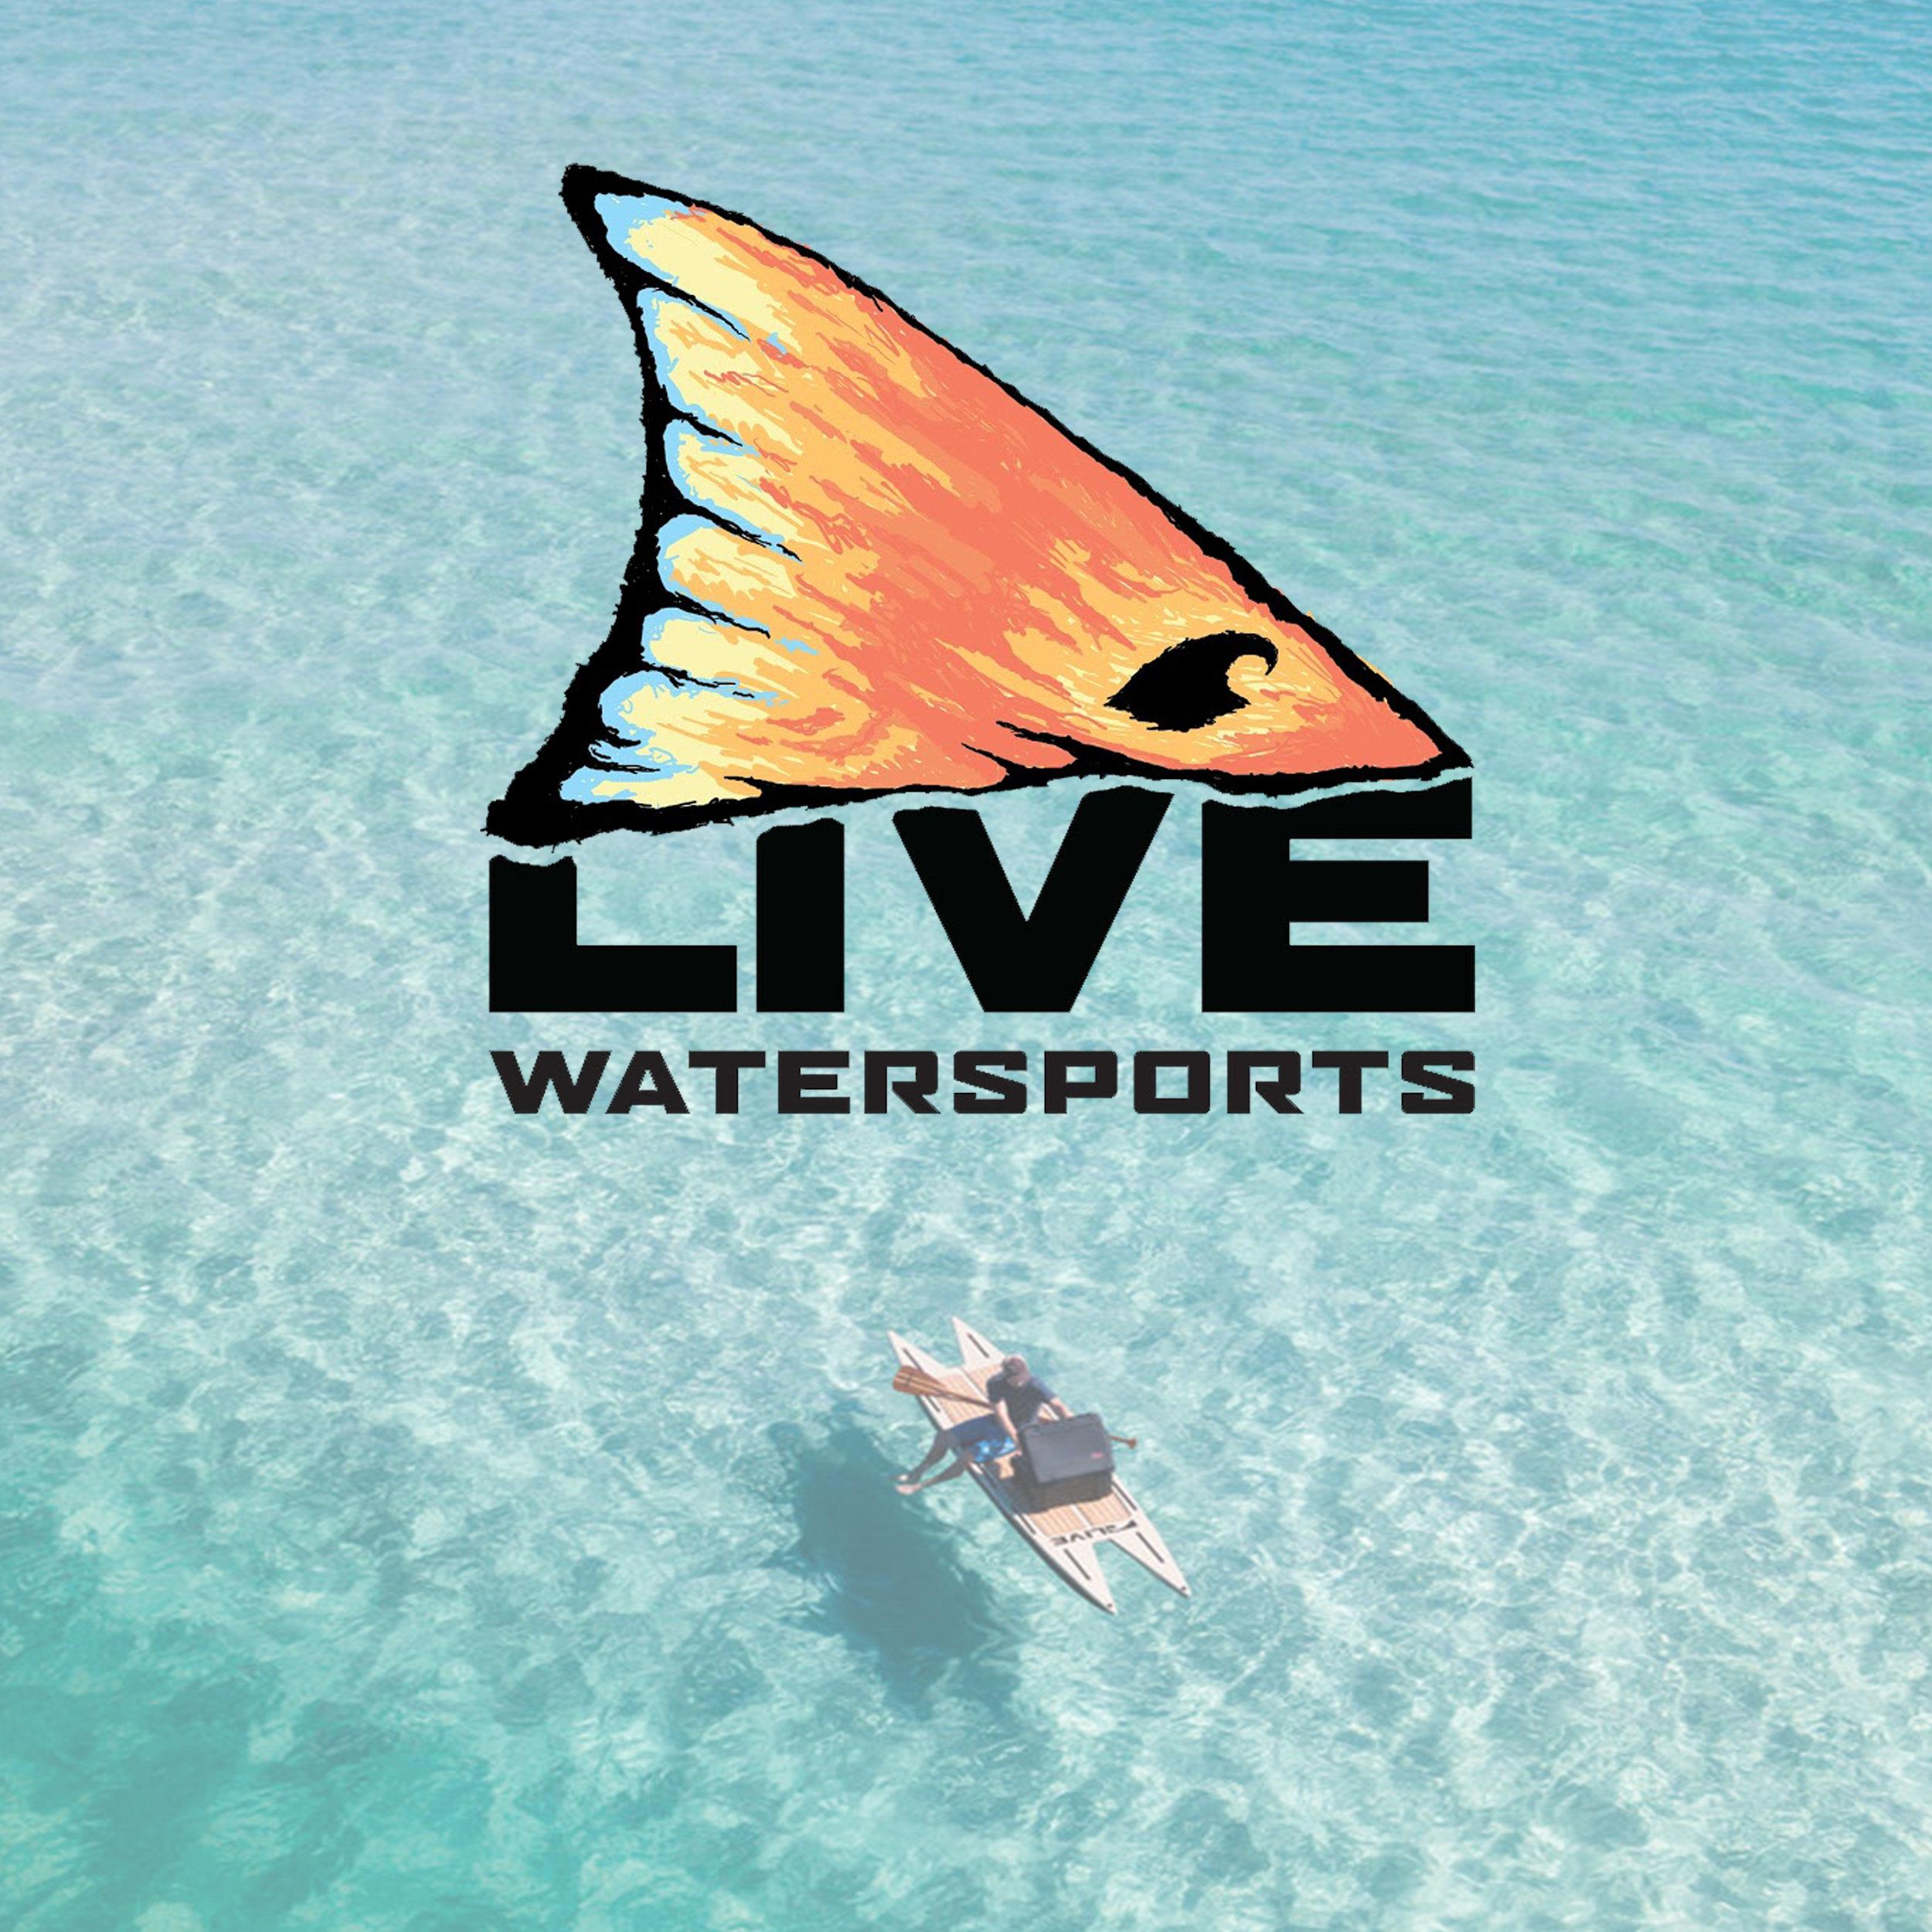 live water sports.jpg